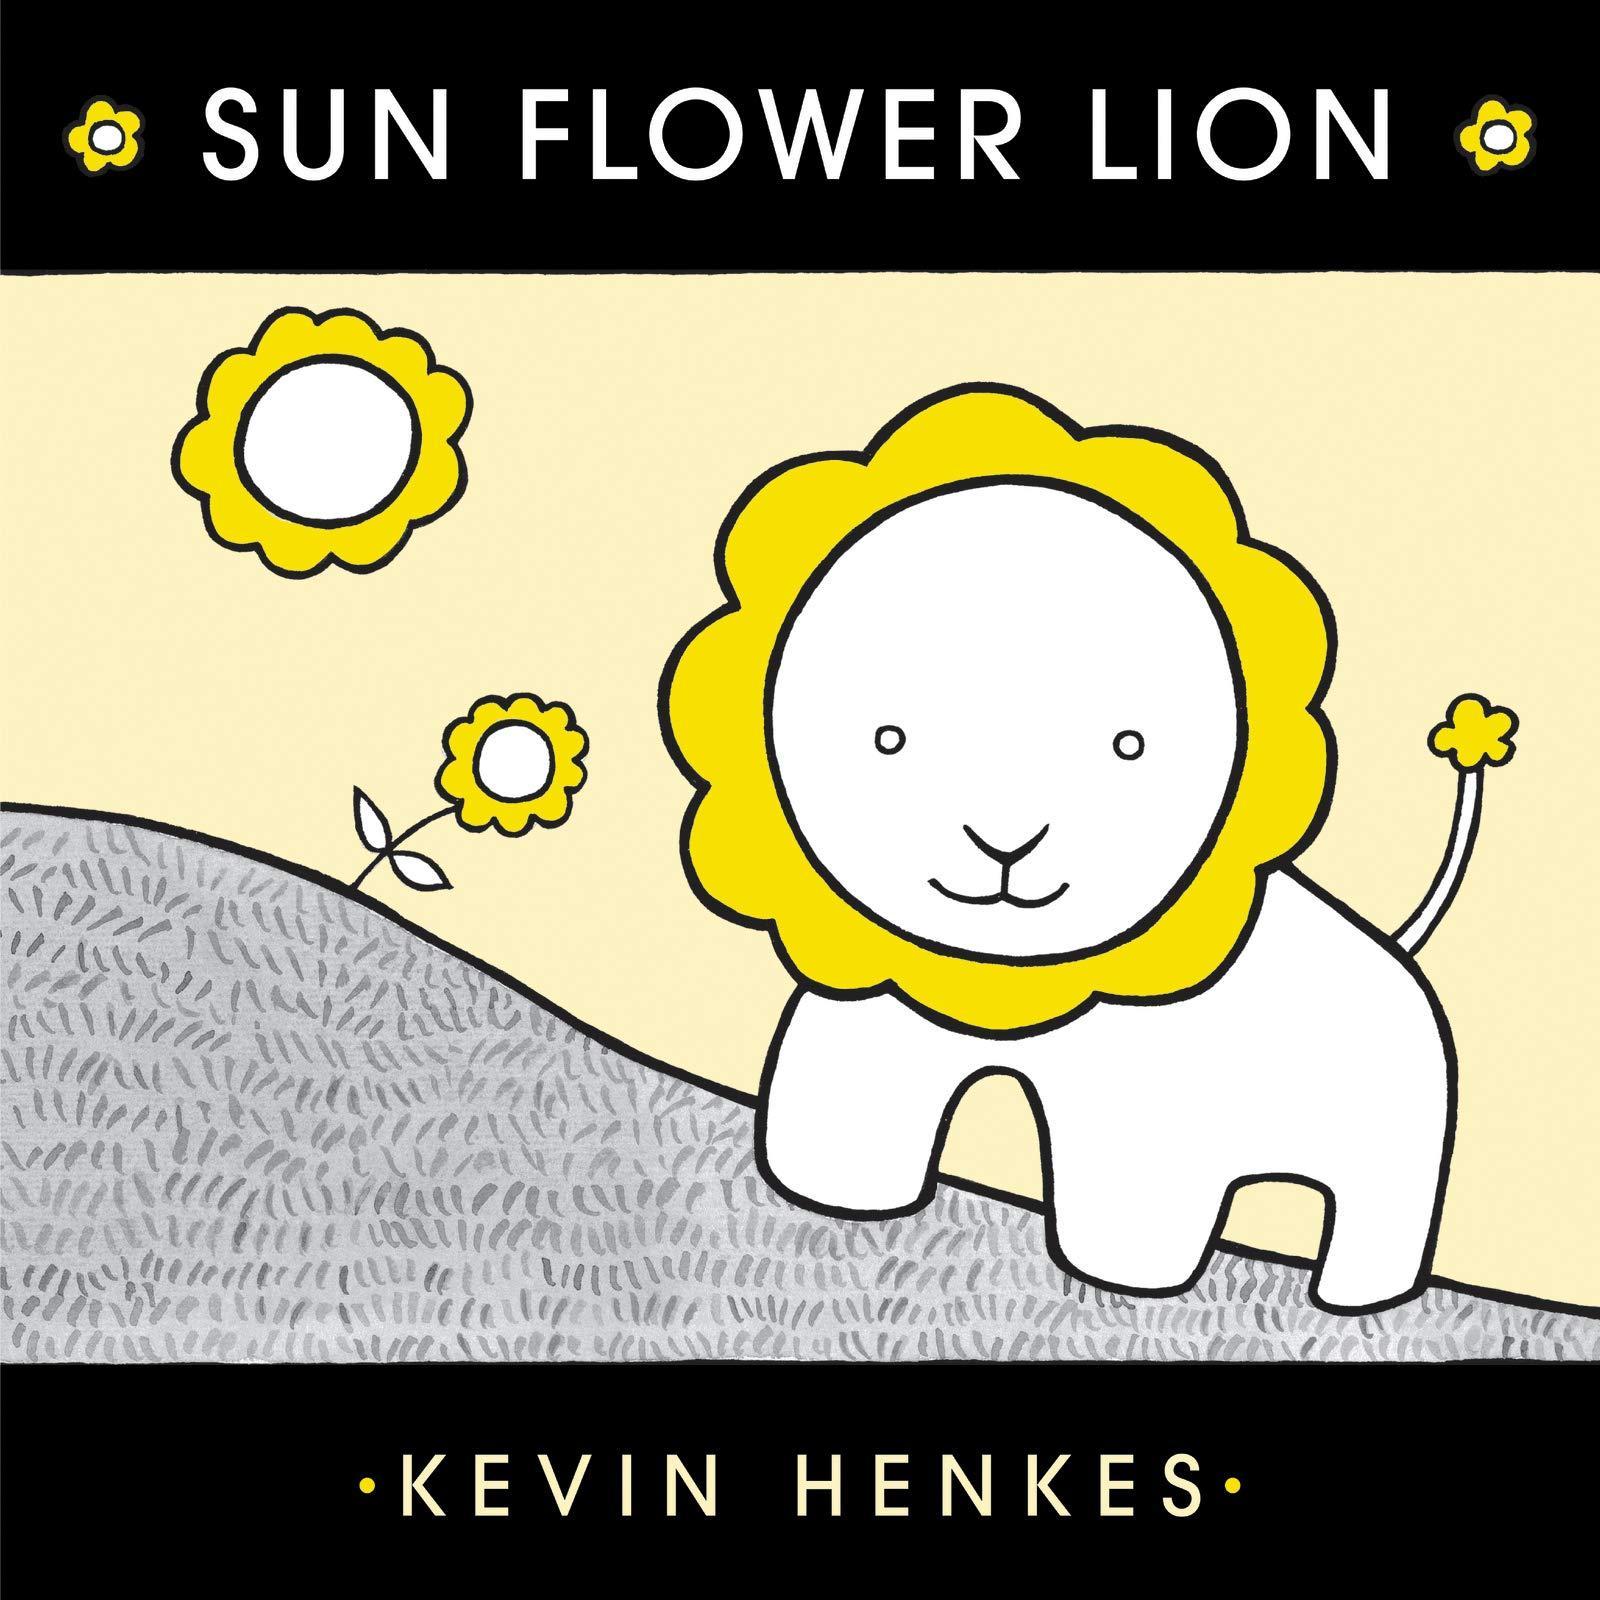 Sun flower lion  by Henkes, Kevin